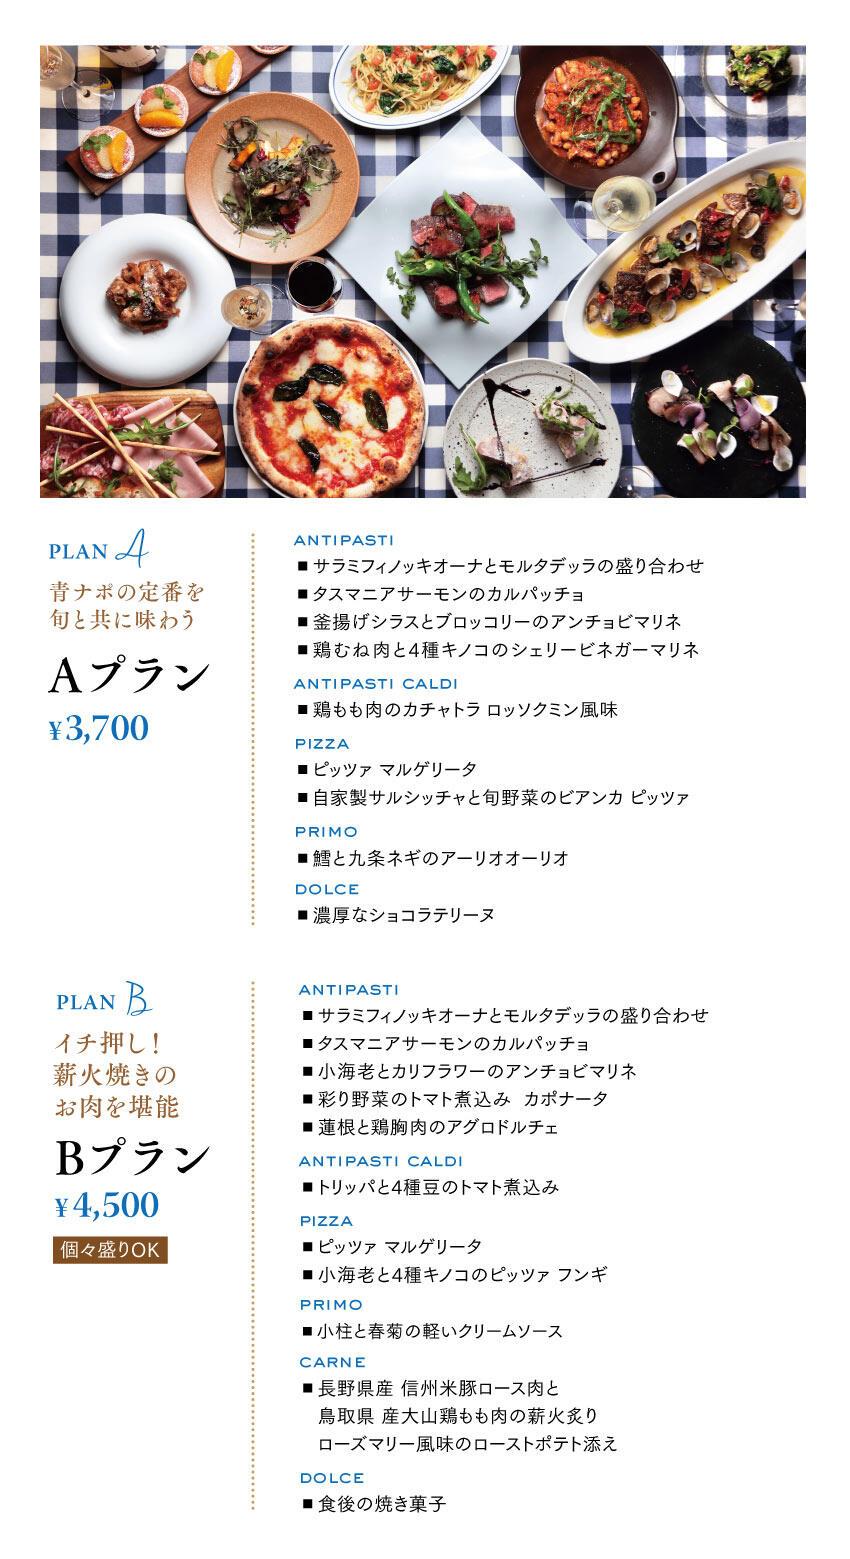 aoi_plan_A.jpg